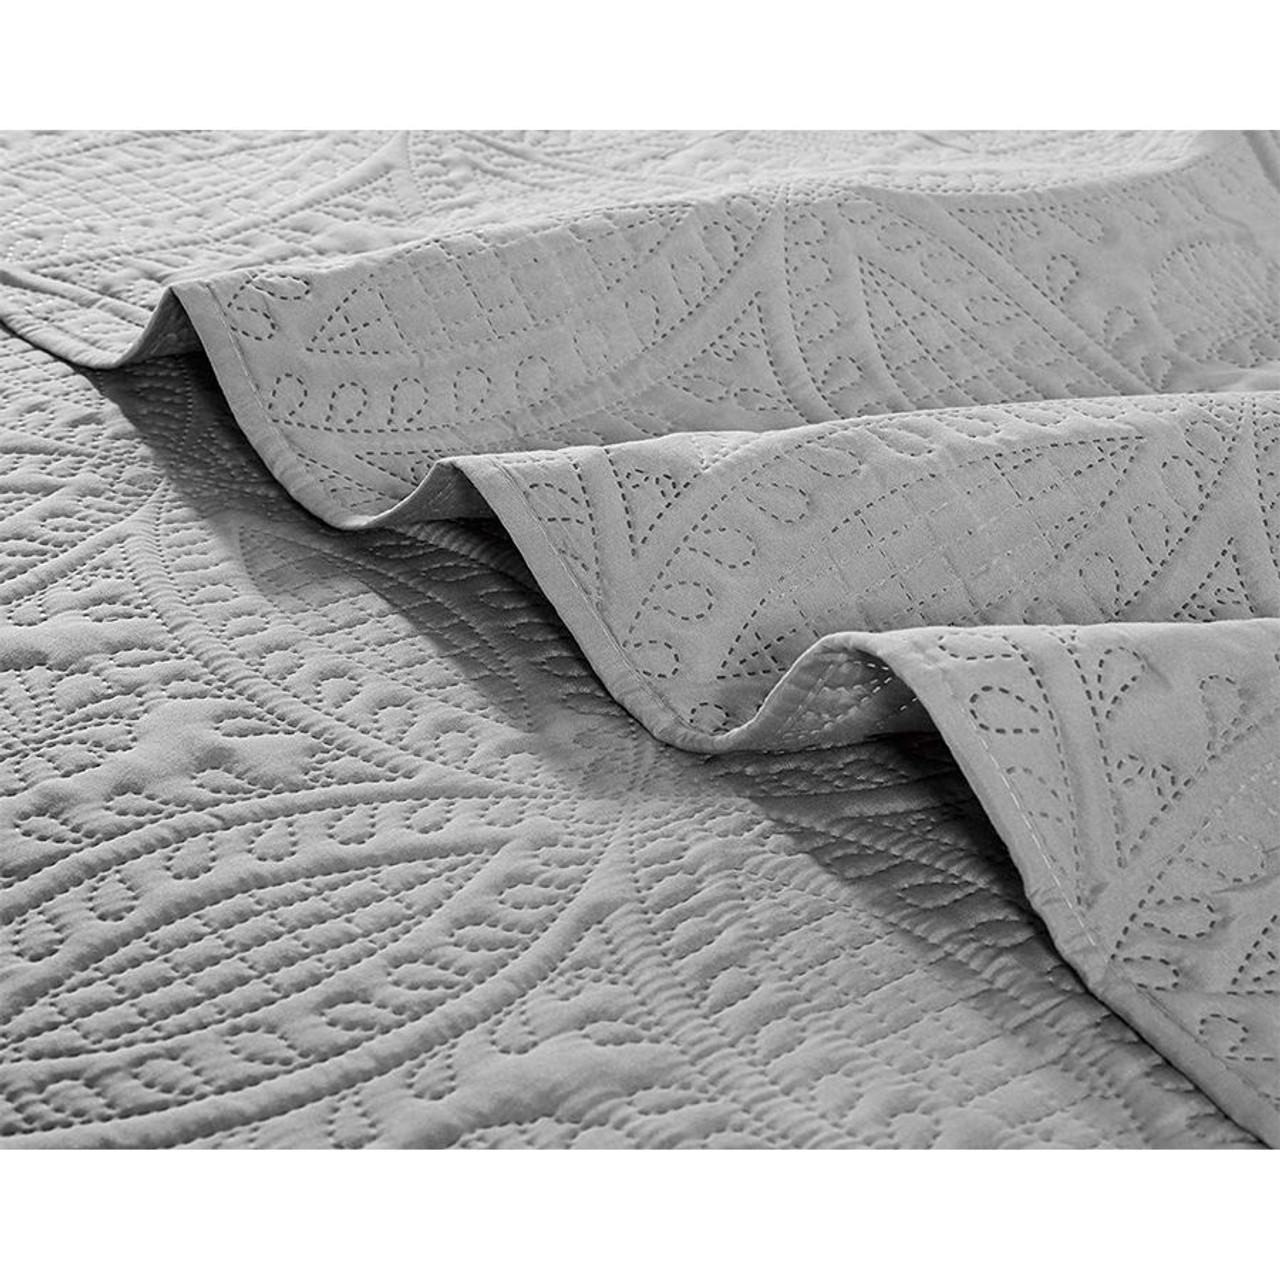 3 Pc Oversized Bedspread Coverlet Set Charcoal Color in USA, California, New York, New York City, Los Angeles, San Francisco, Pennsylvania, Washington DC, Virginia and Maryland